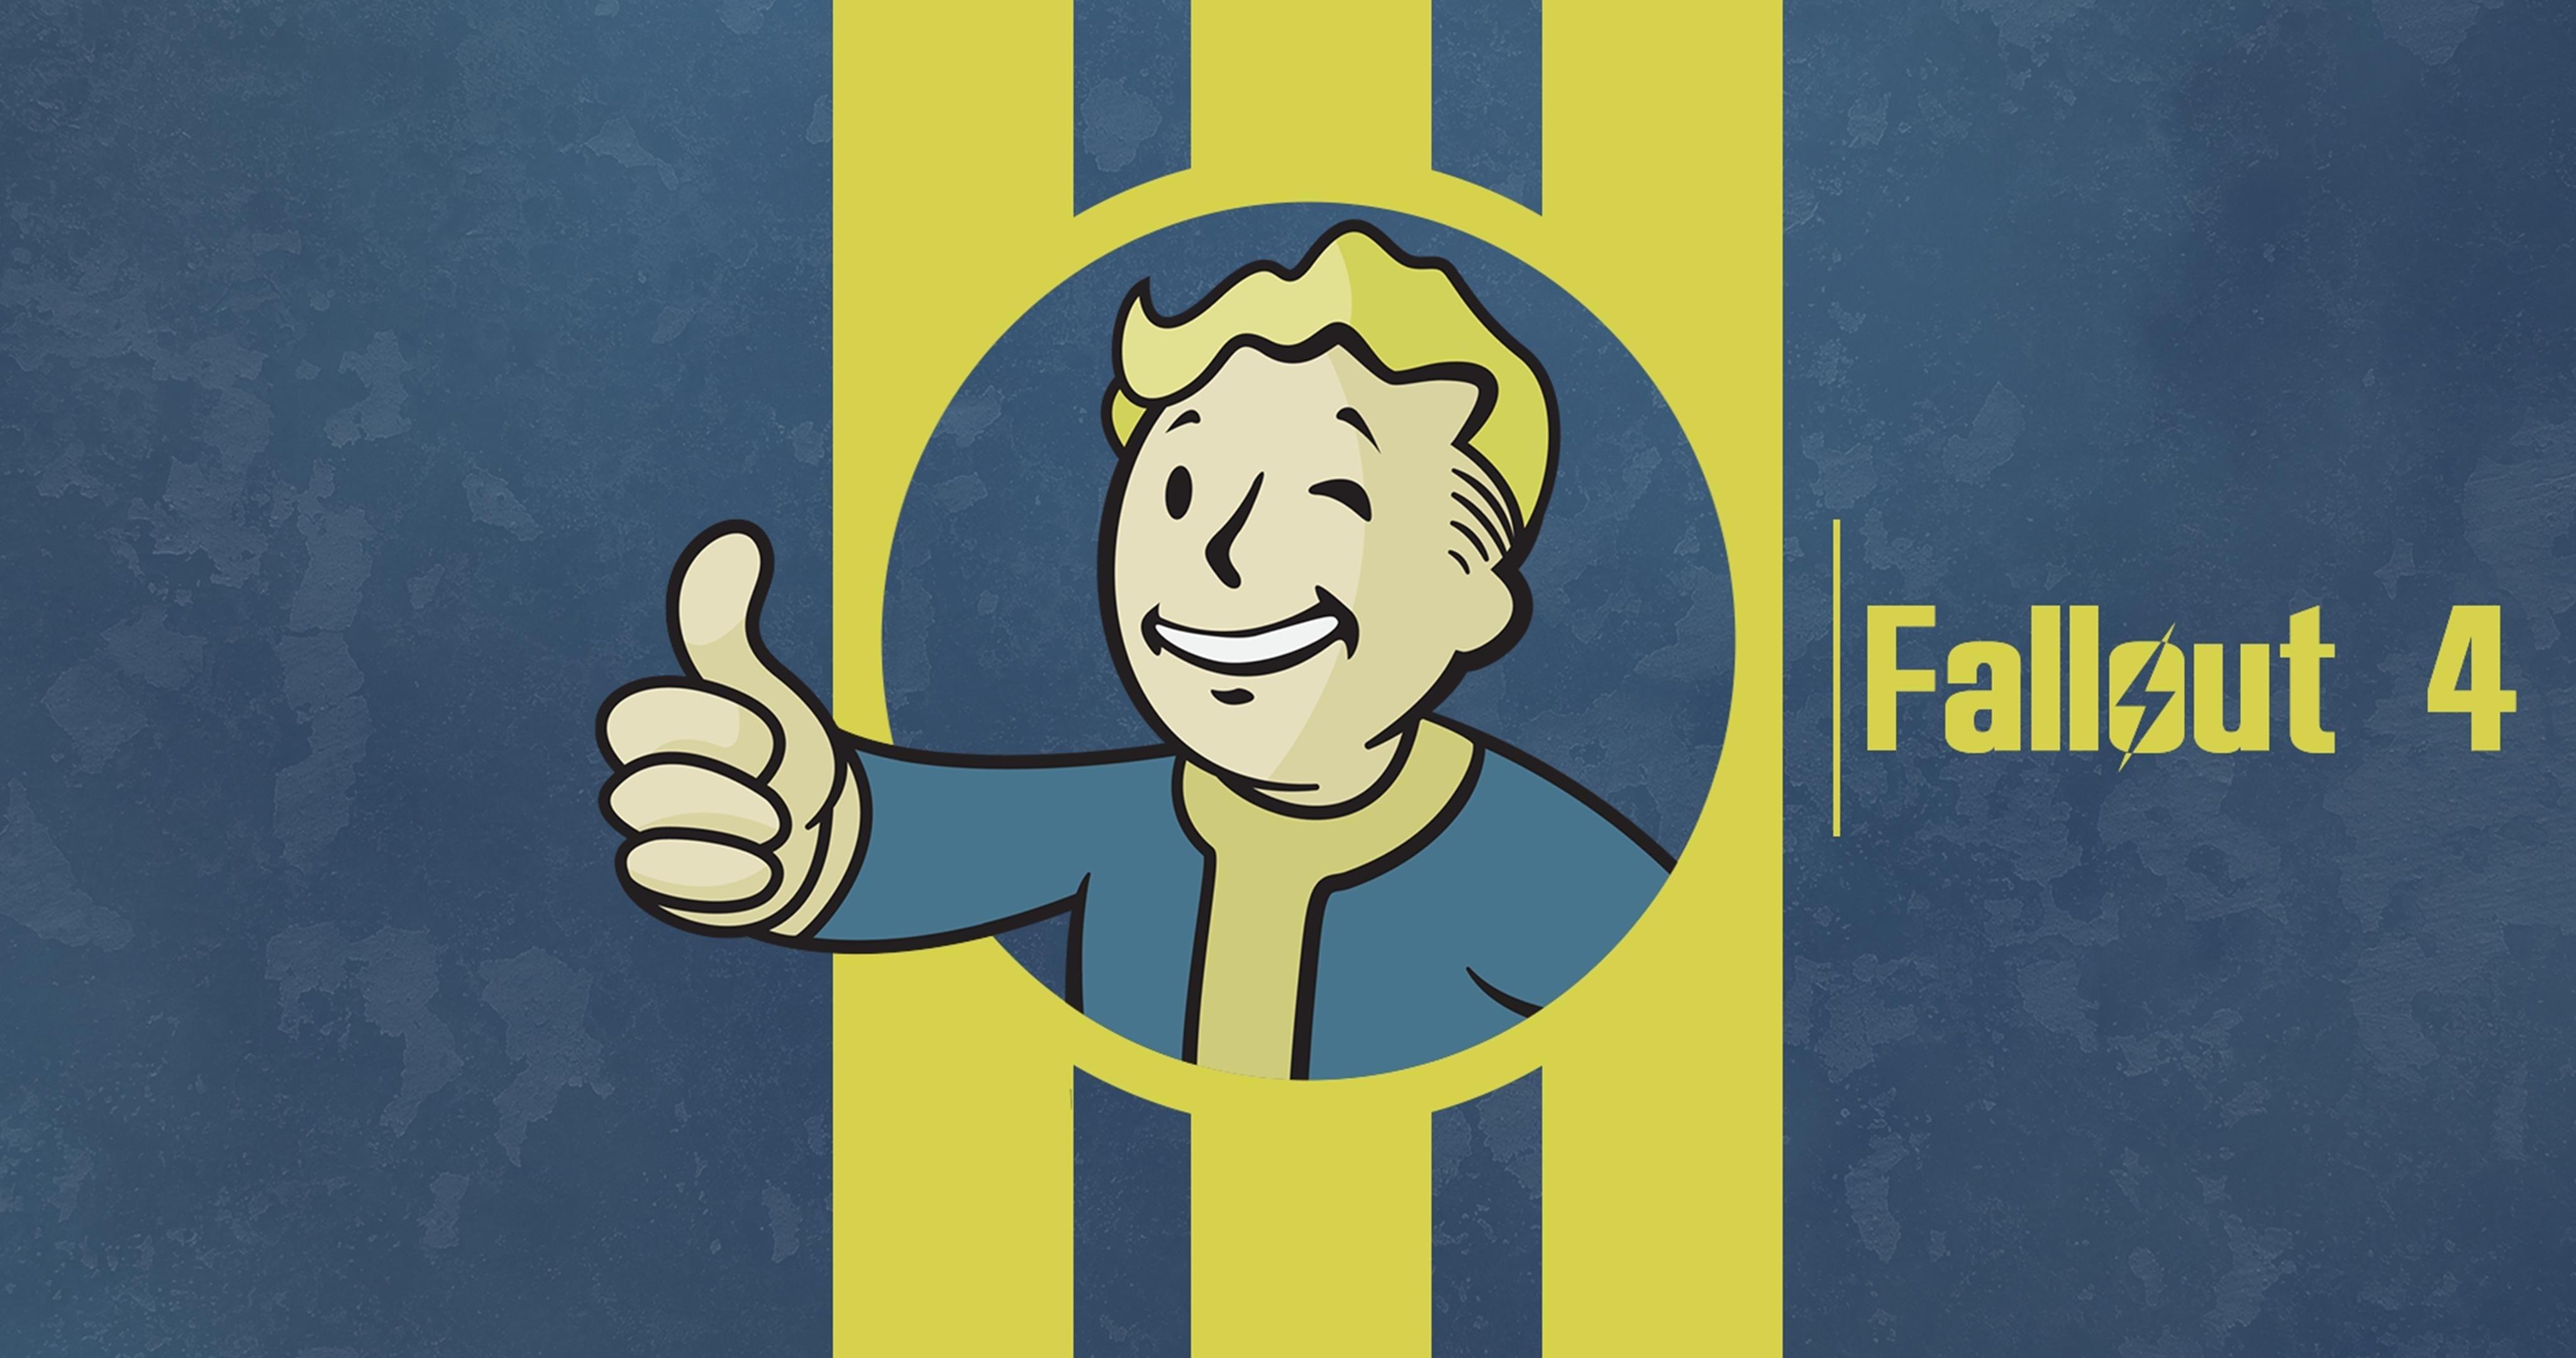 fallout 4 vault boy wallpaper - prints - one canvas | gaming | pinterest